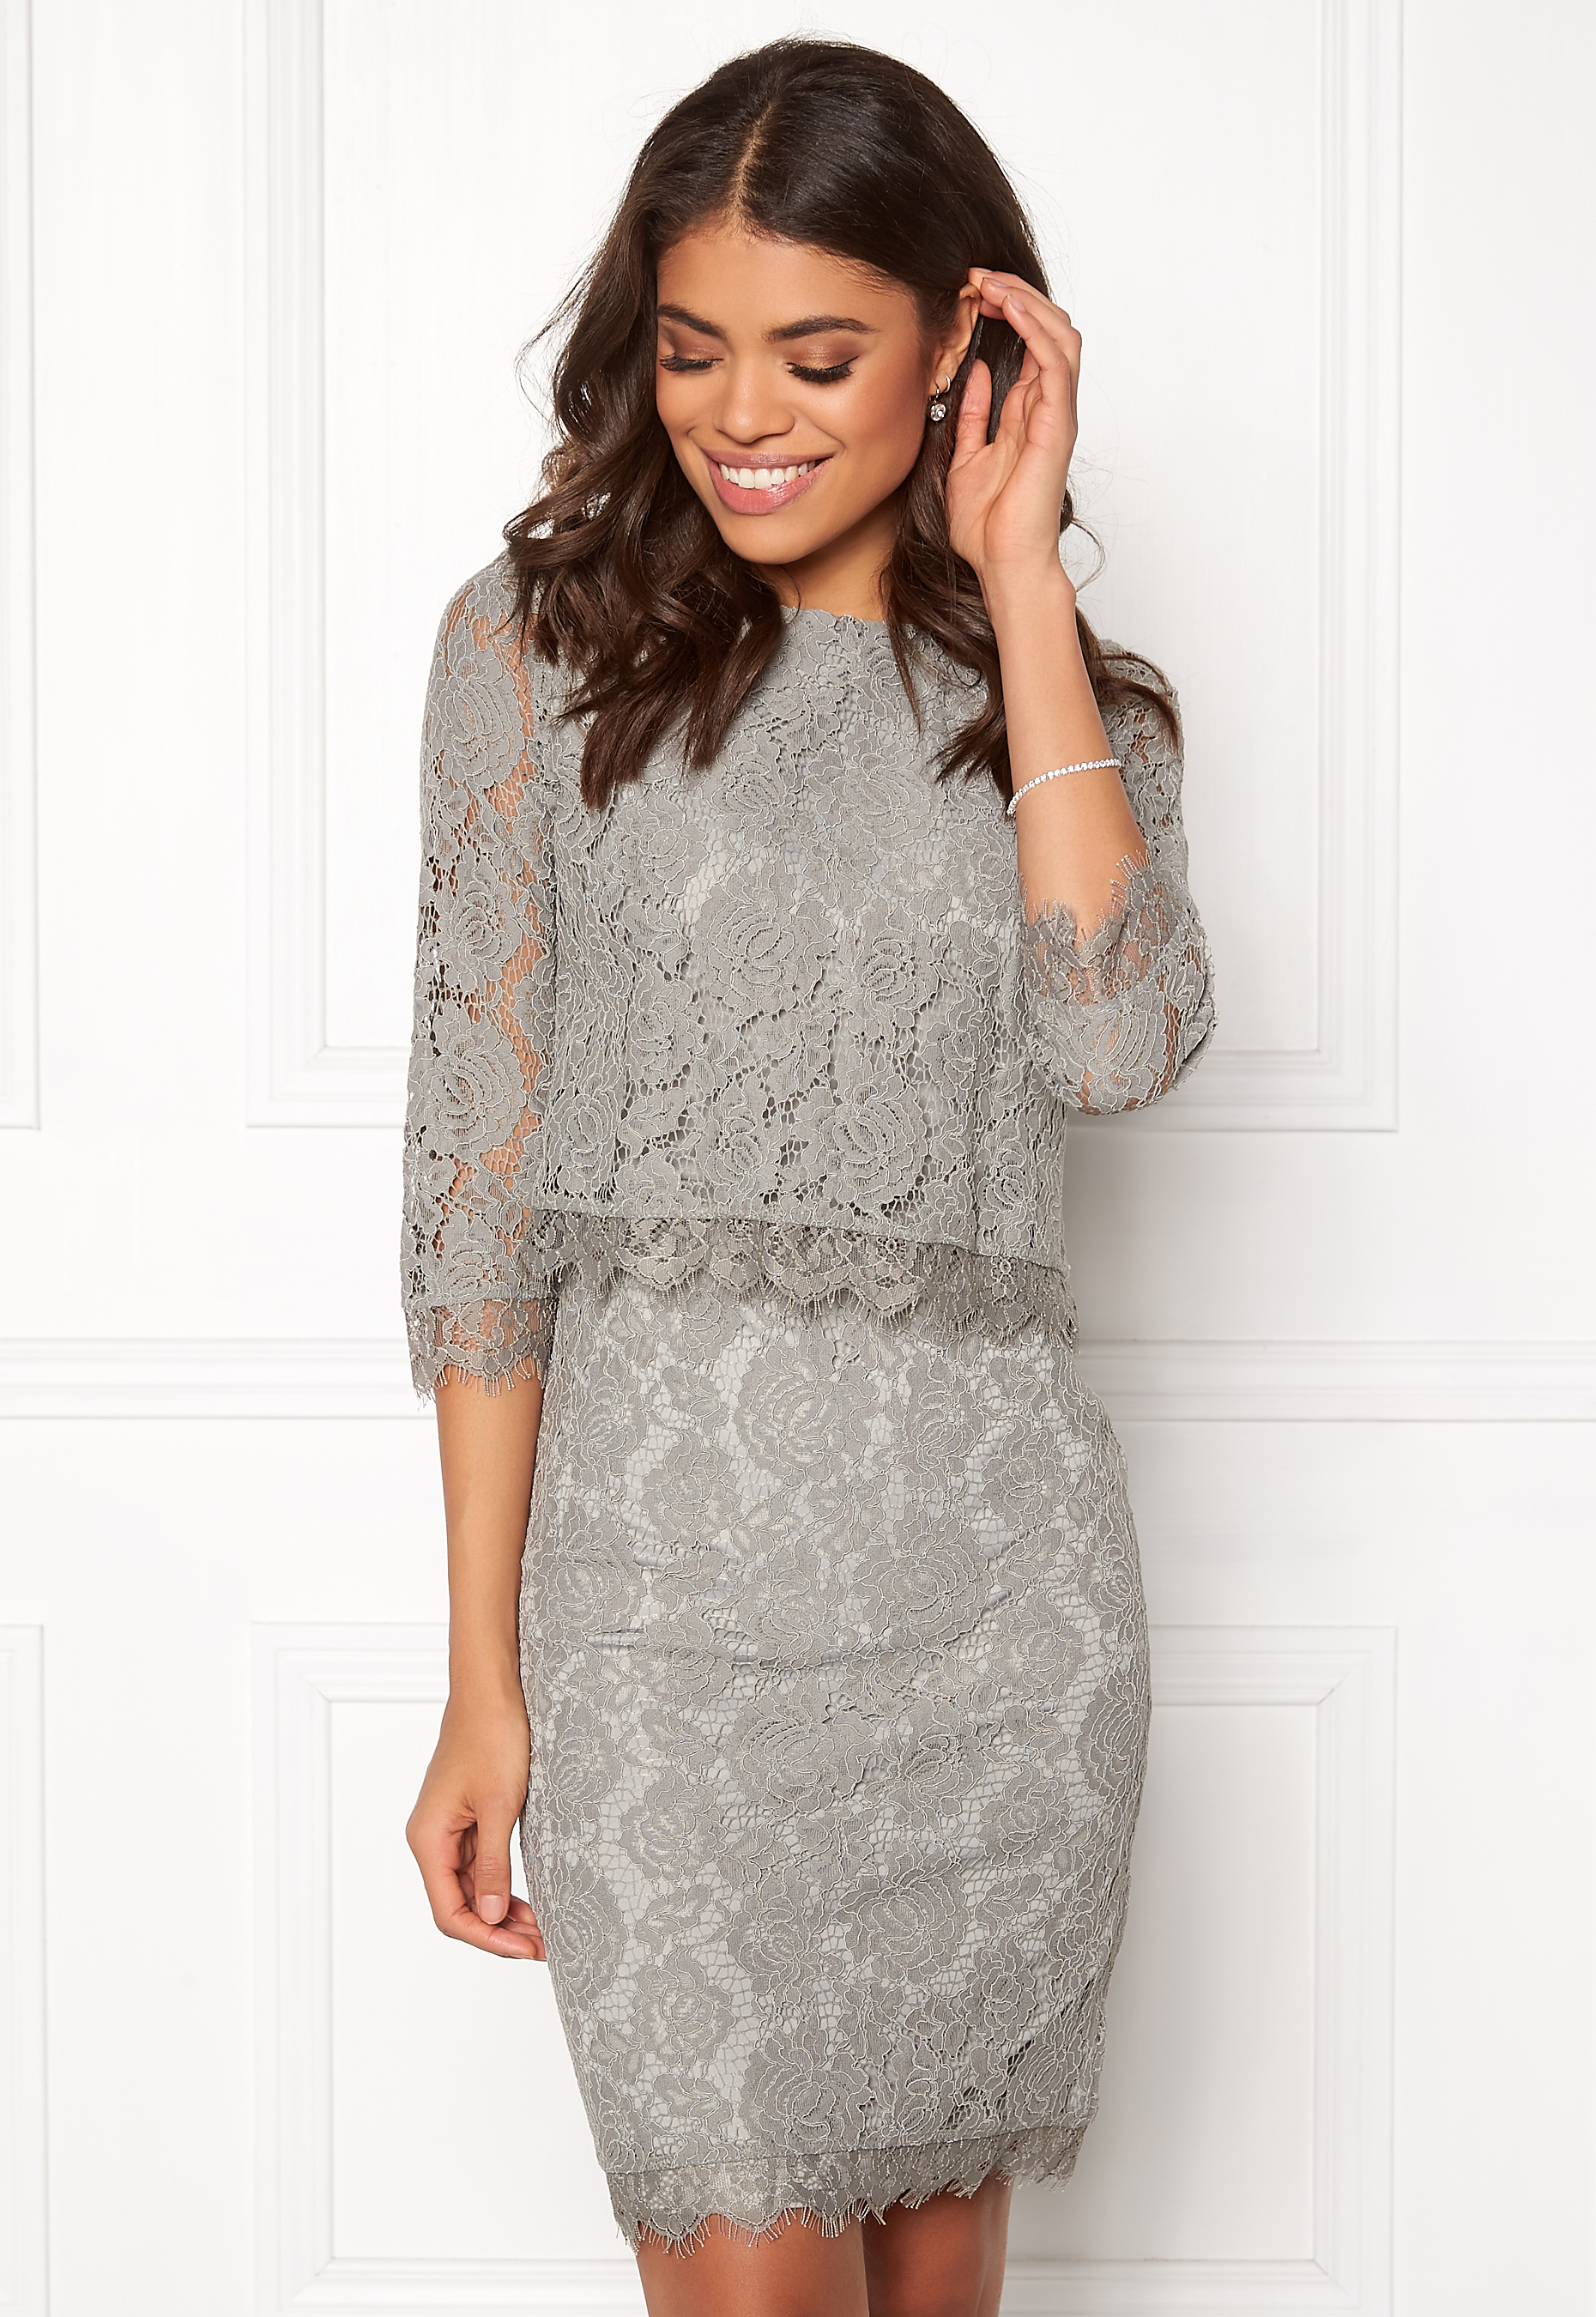 a37e0f563c52 DRY LAKE Malou Dress Light Grey - Bubbleroom